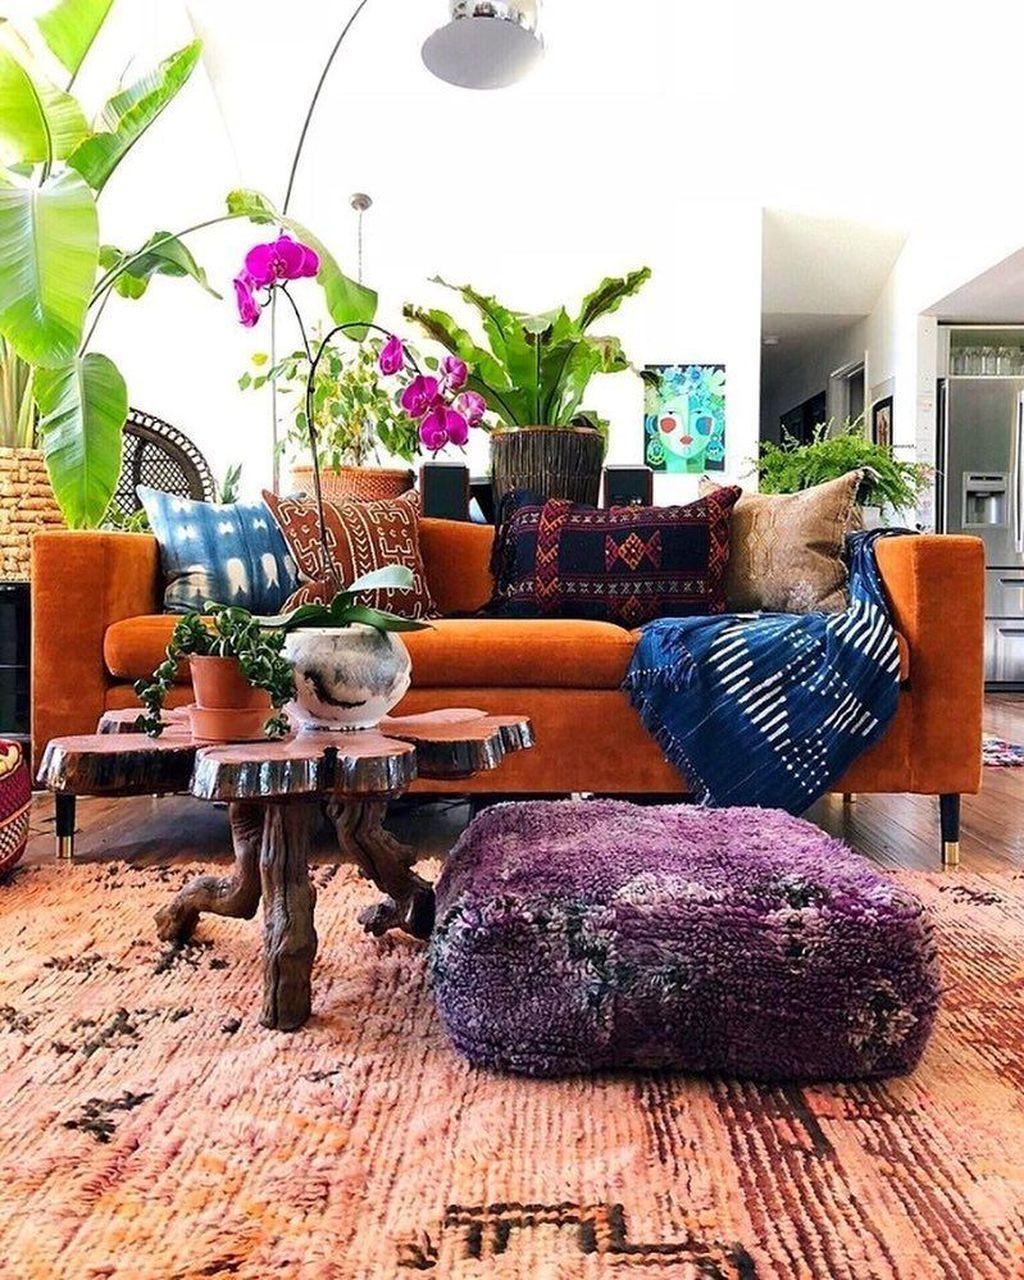 30 Inspiring Bohemian Living Room Ideas For Your Home Bohemian Living Rooms Eclectic Living Room Bohemian Living Room